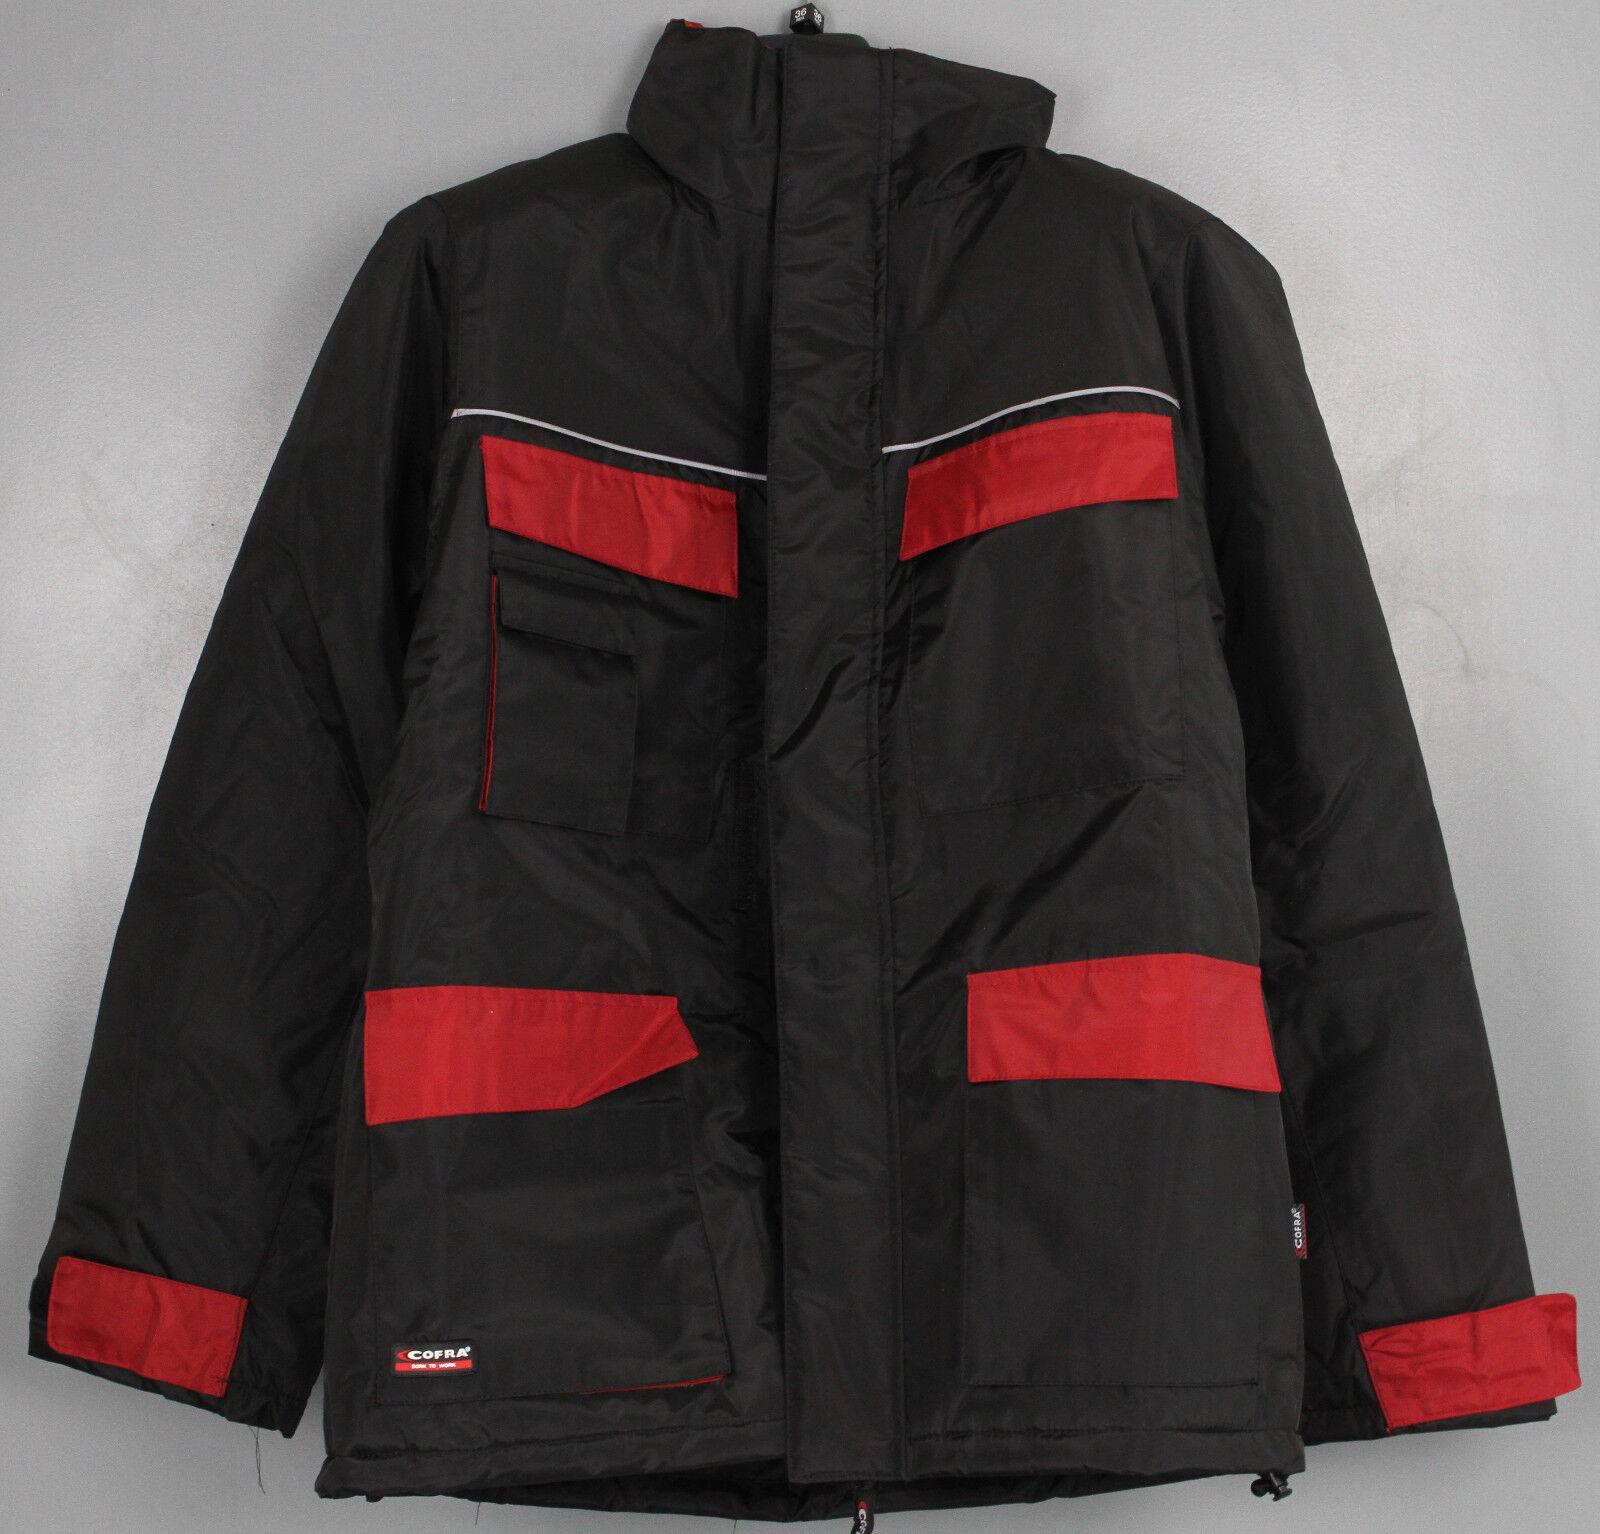 Veste classe maroc